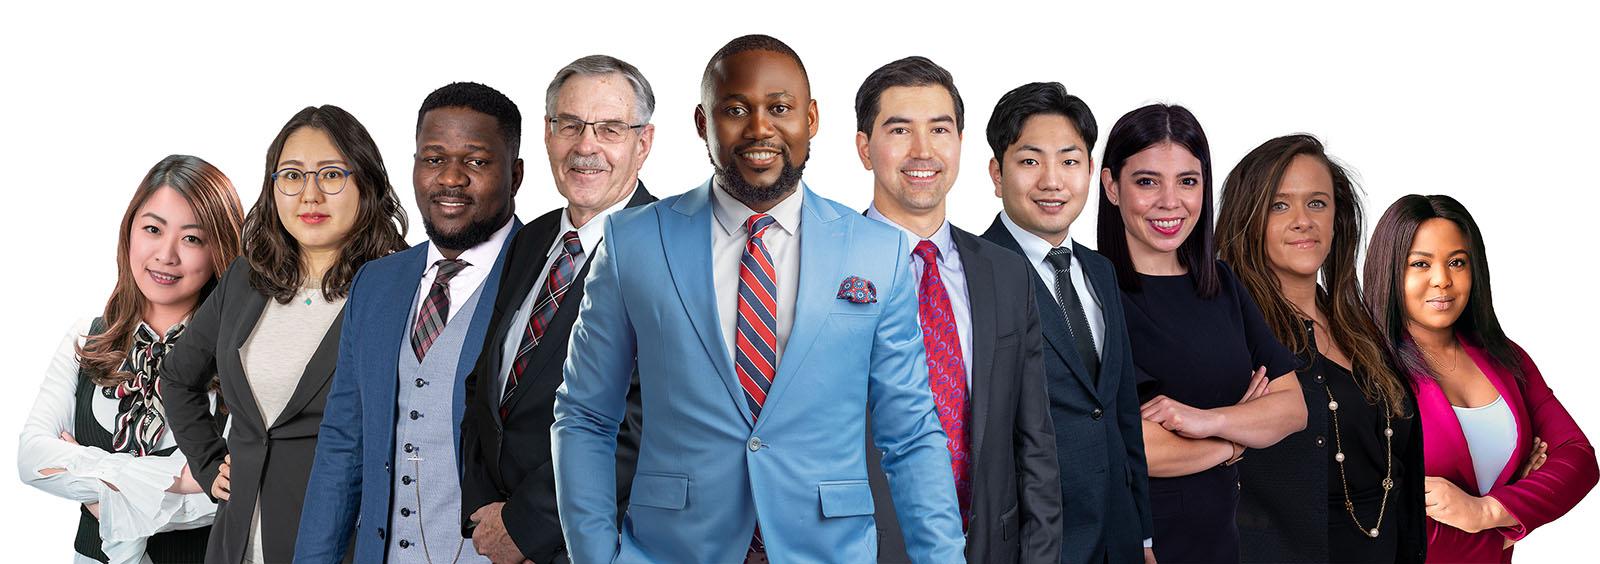 Calgary-Lawyers-Osuji-and-Smith-Award-Winning